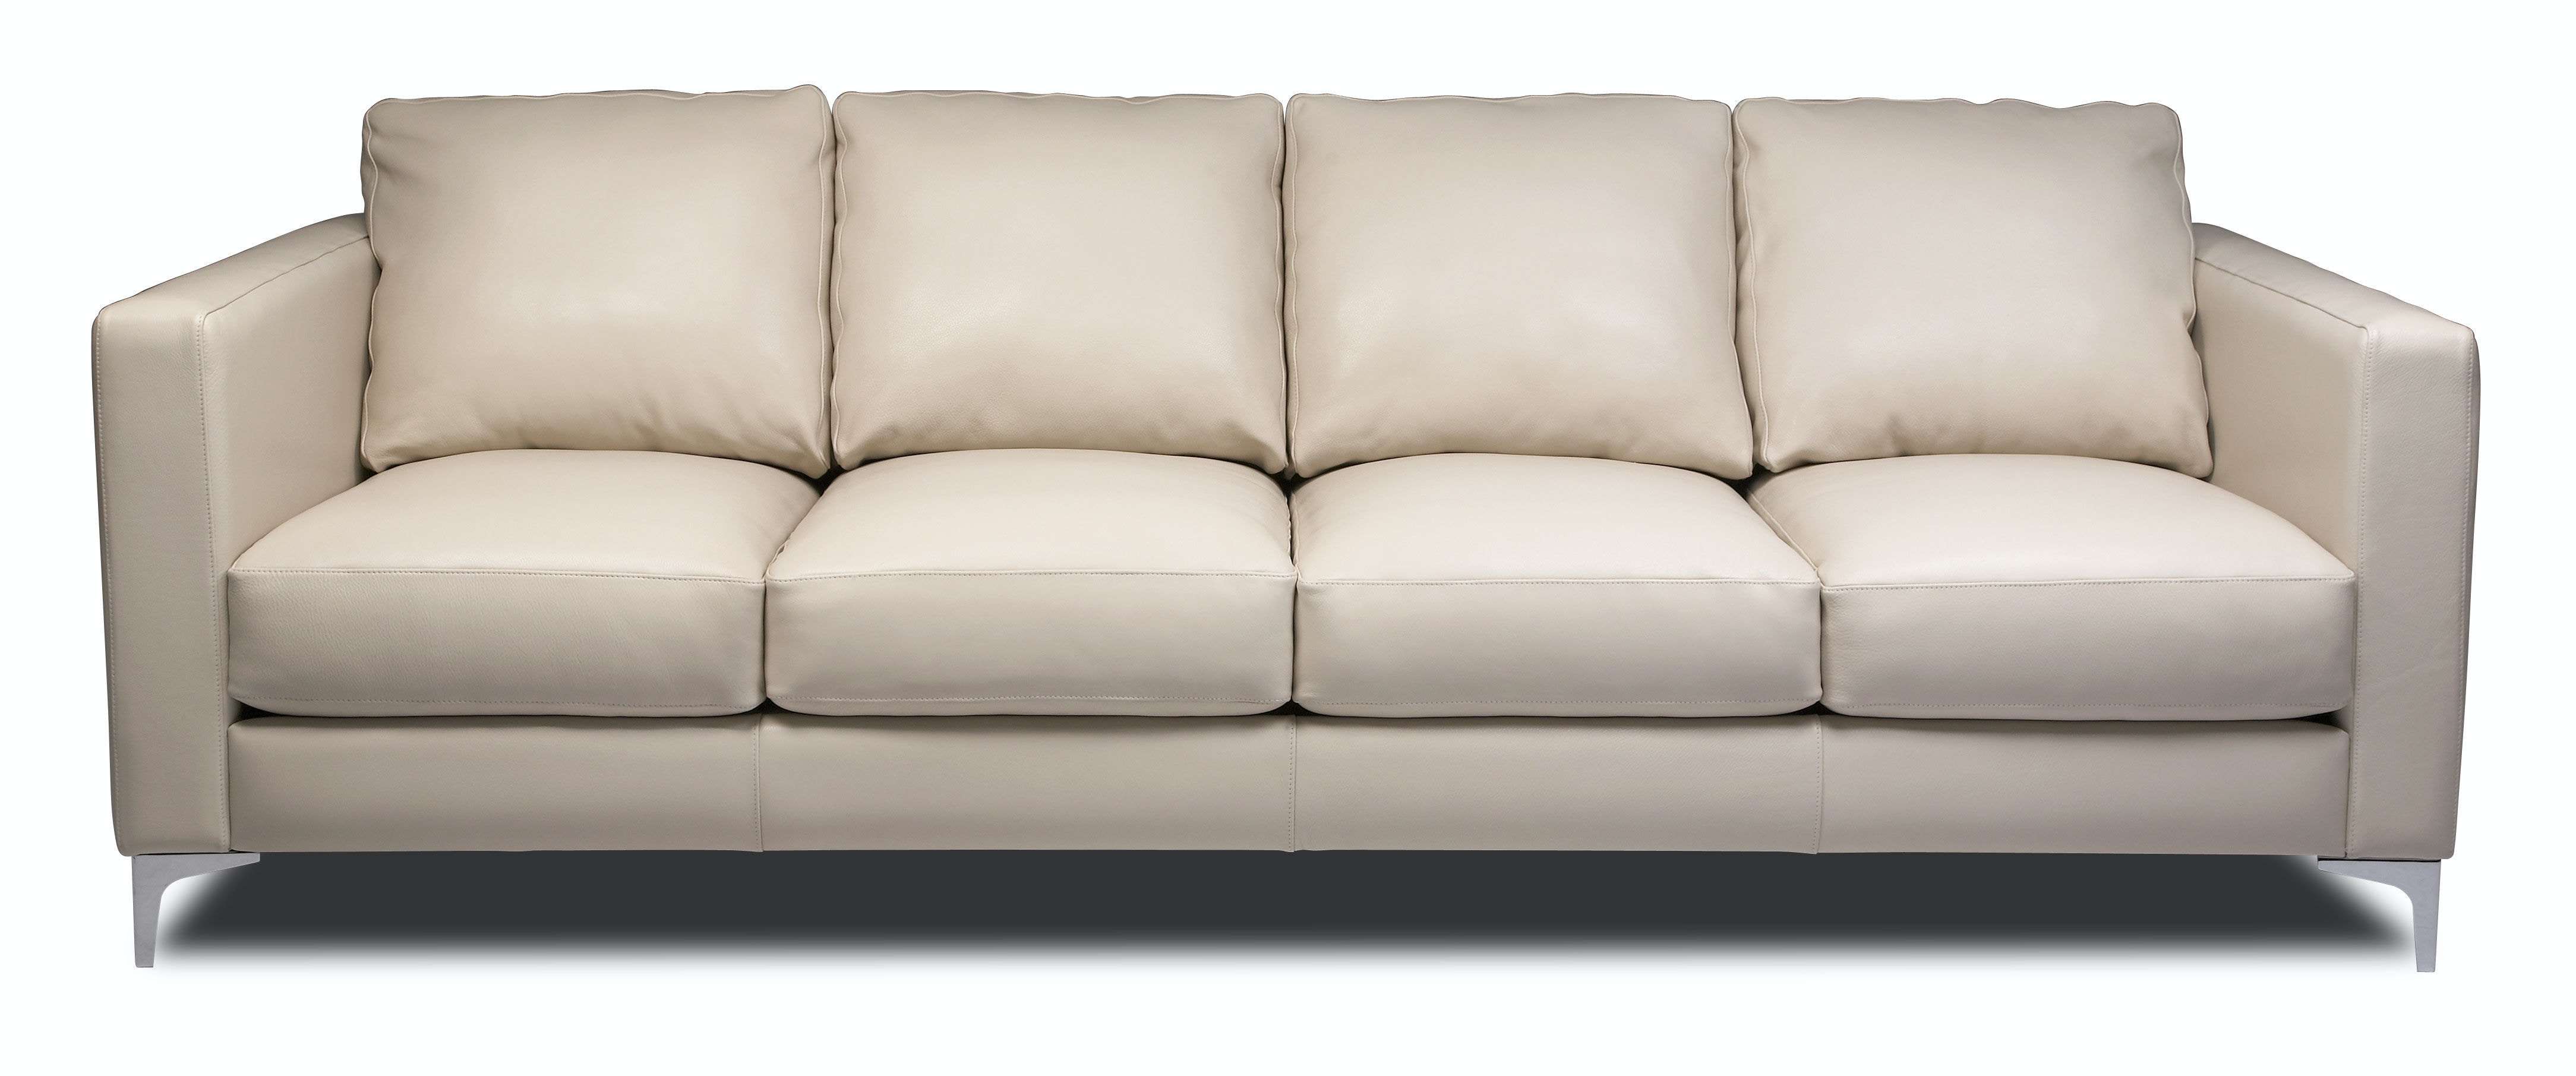 Genial American Leather Four Cushion Sofa AMLKNDSO4ST From Walter E. Smithe  Furniture + Design